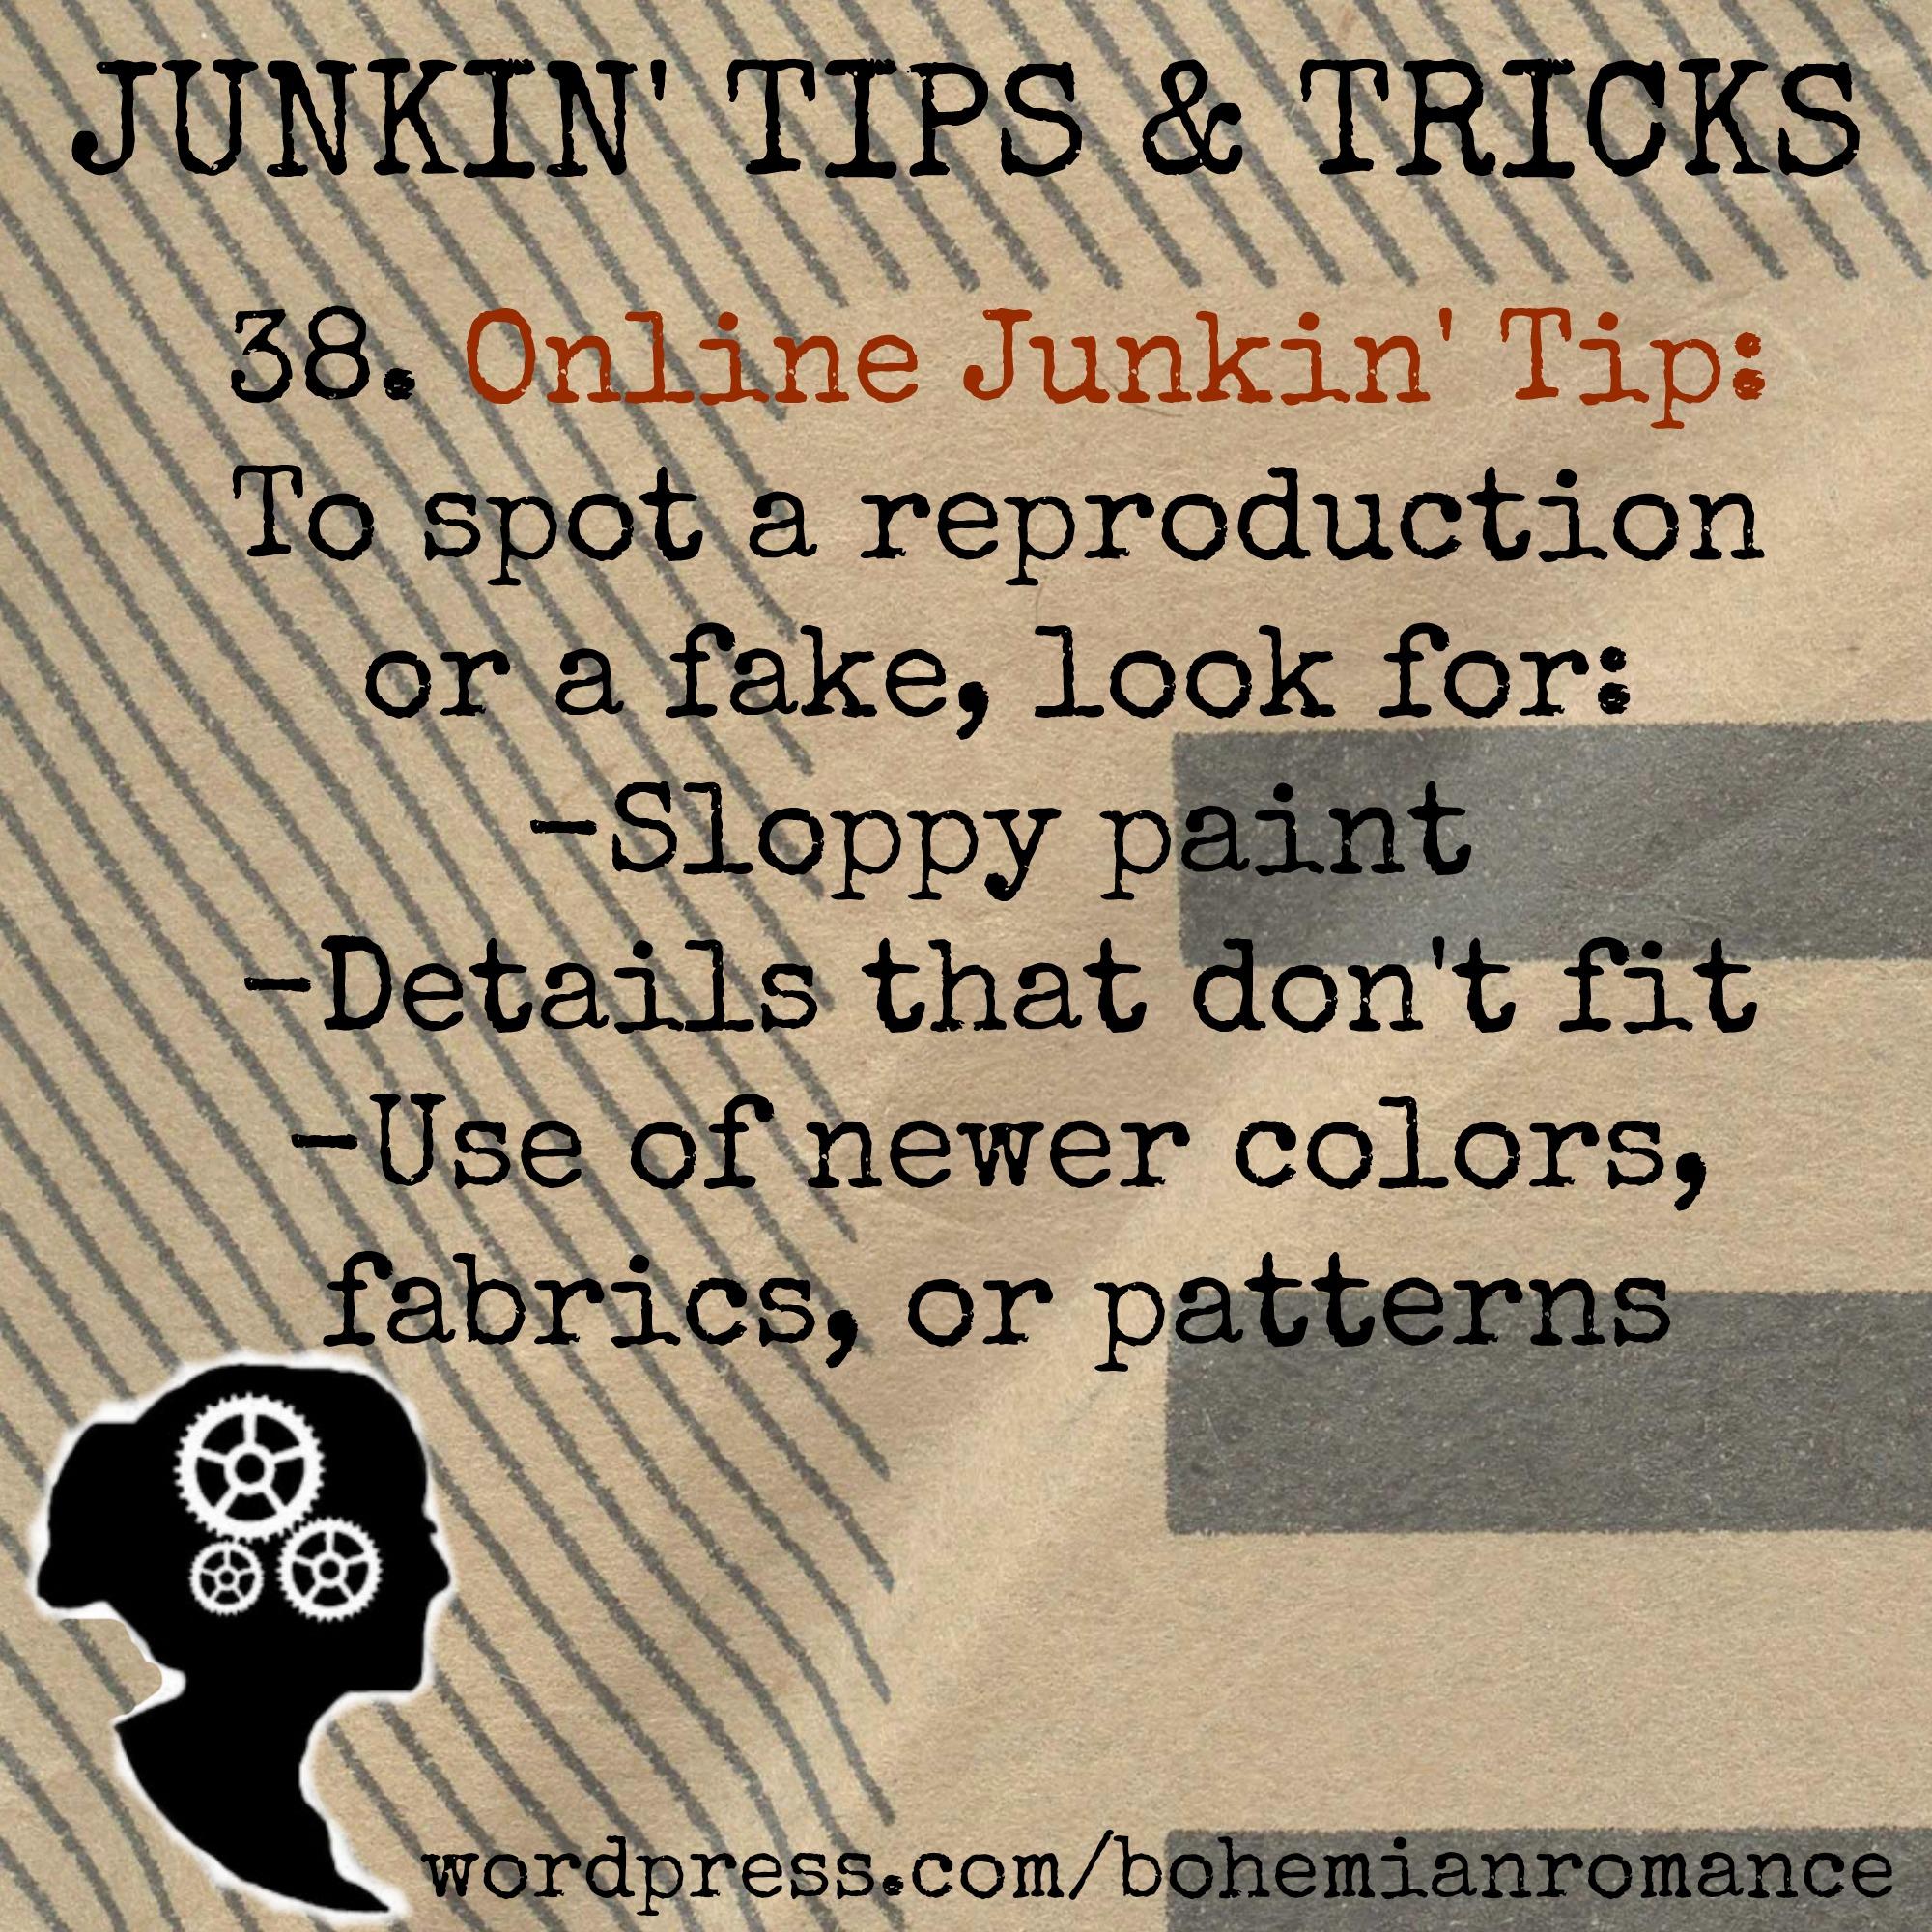 Junkin Tips 38